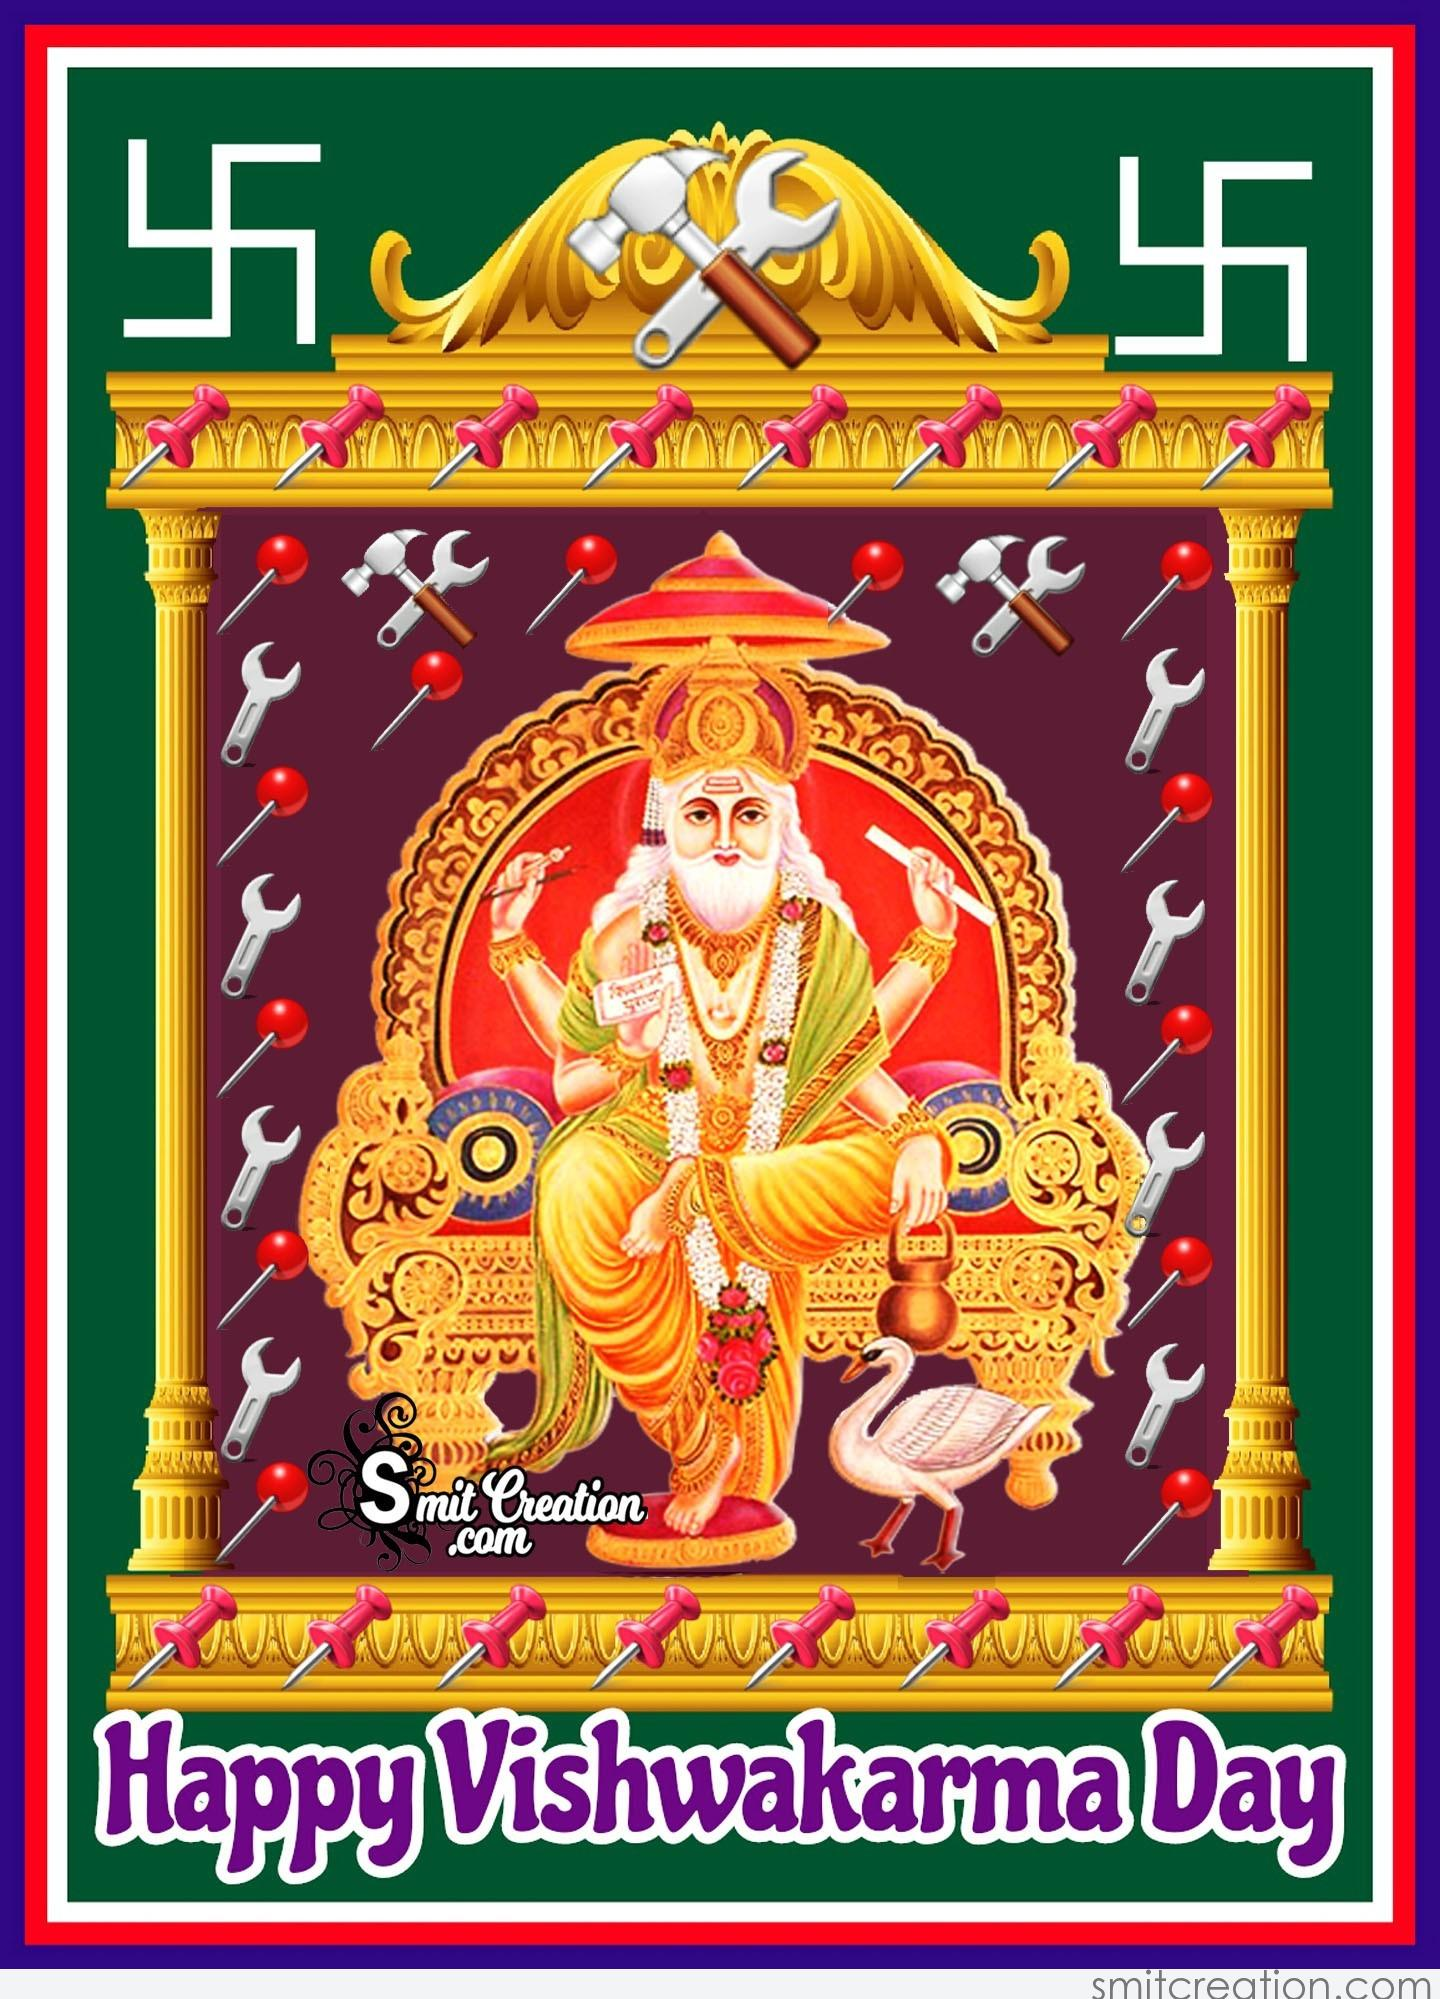 Happy Life Quotes Wallpaper Vishwakarma Puja Pictures And Graphics Smitcreation Com